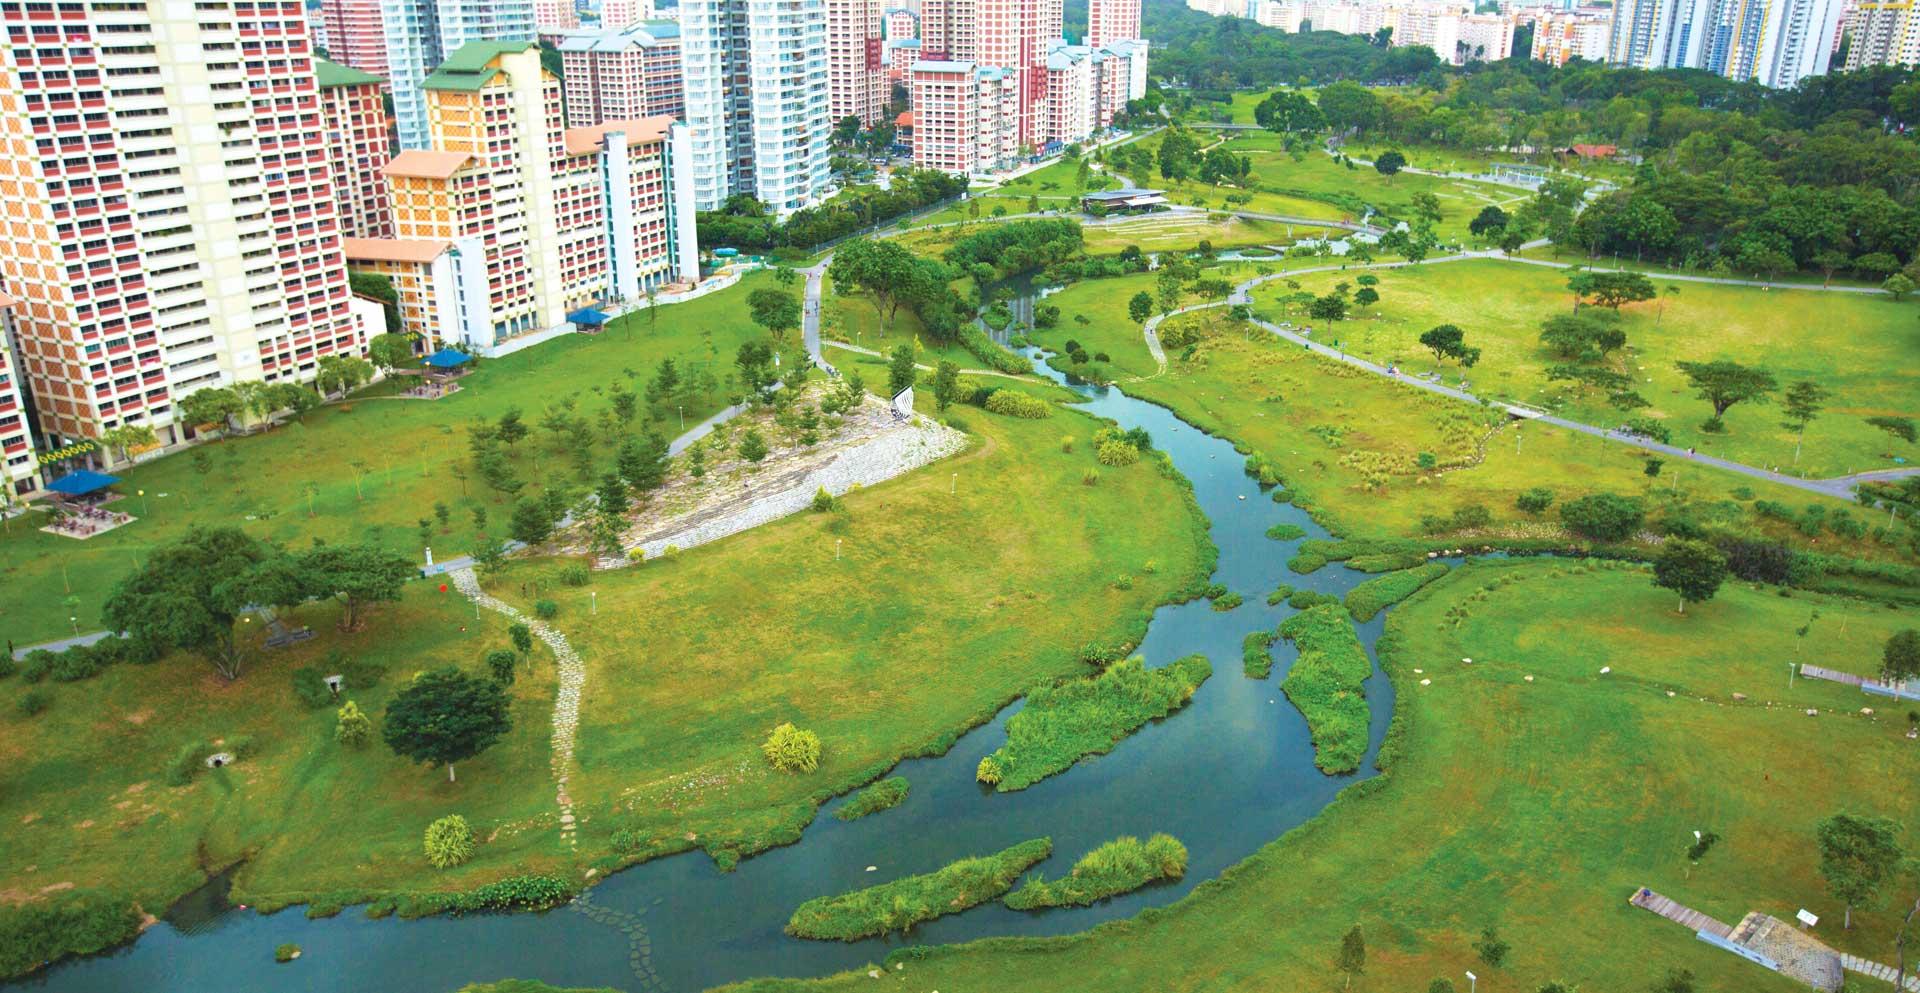 Singapores sustainable development plans malvernweather Choice Image